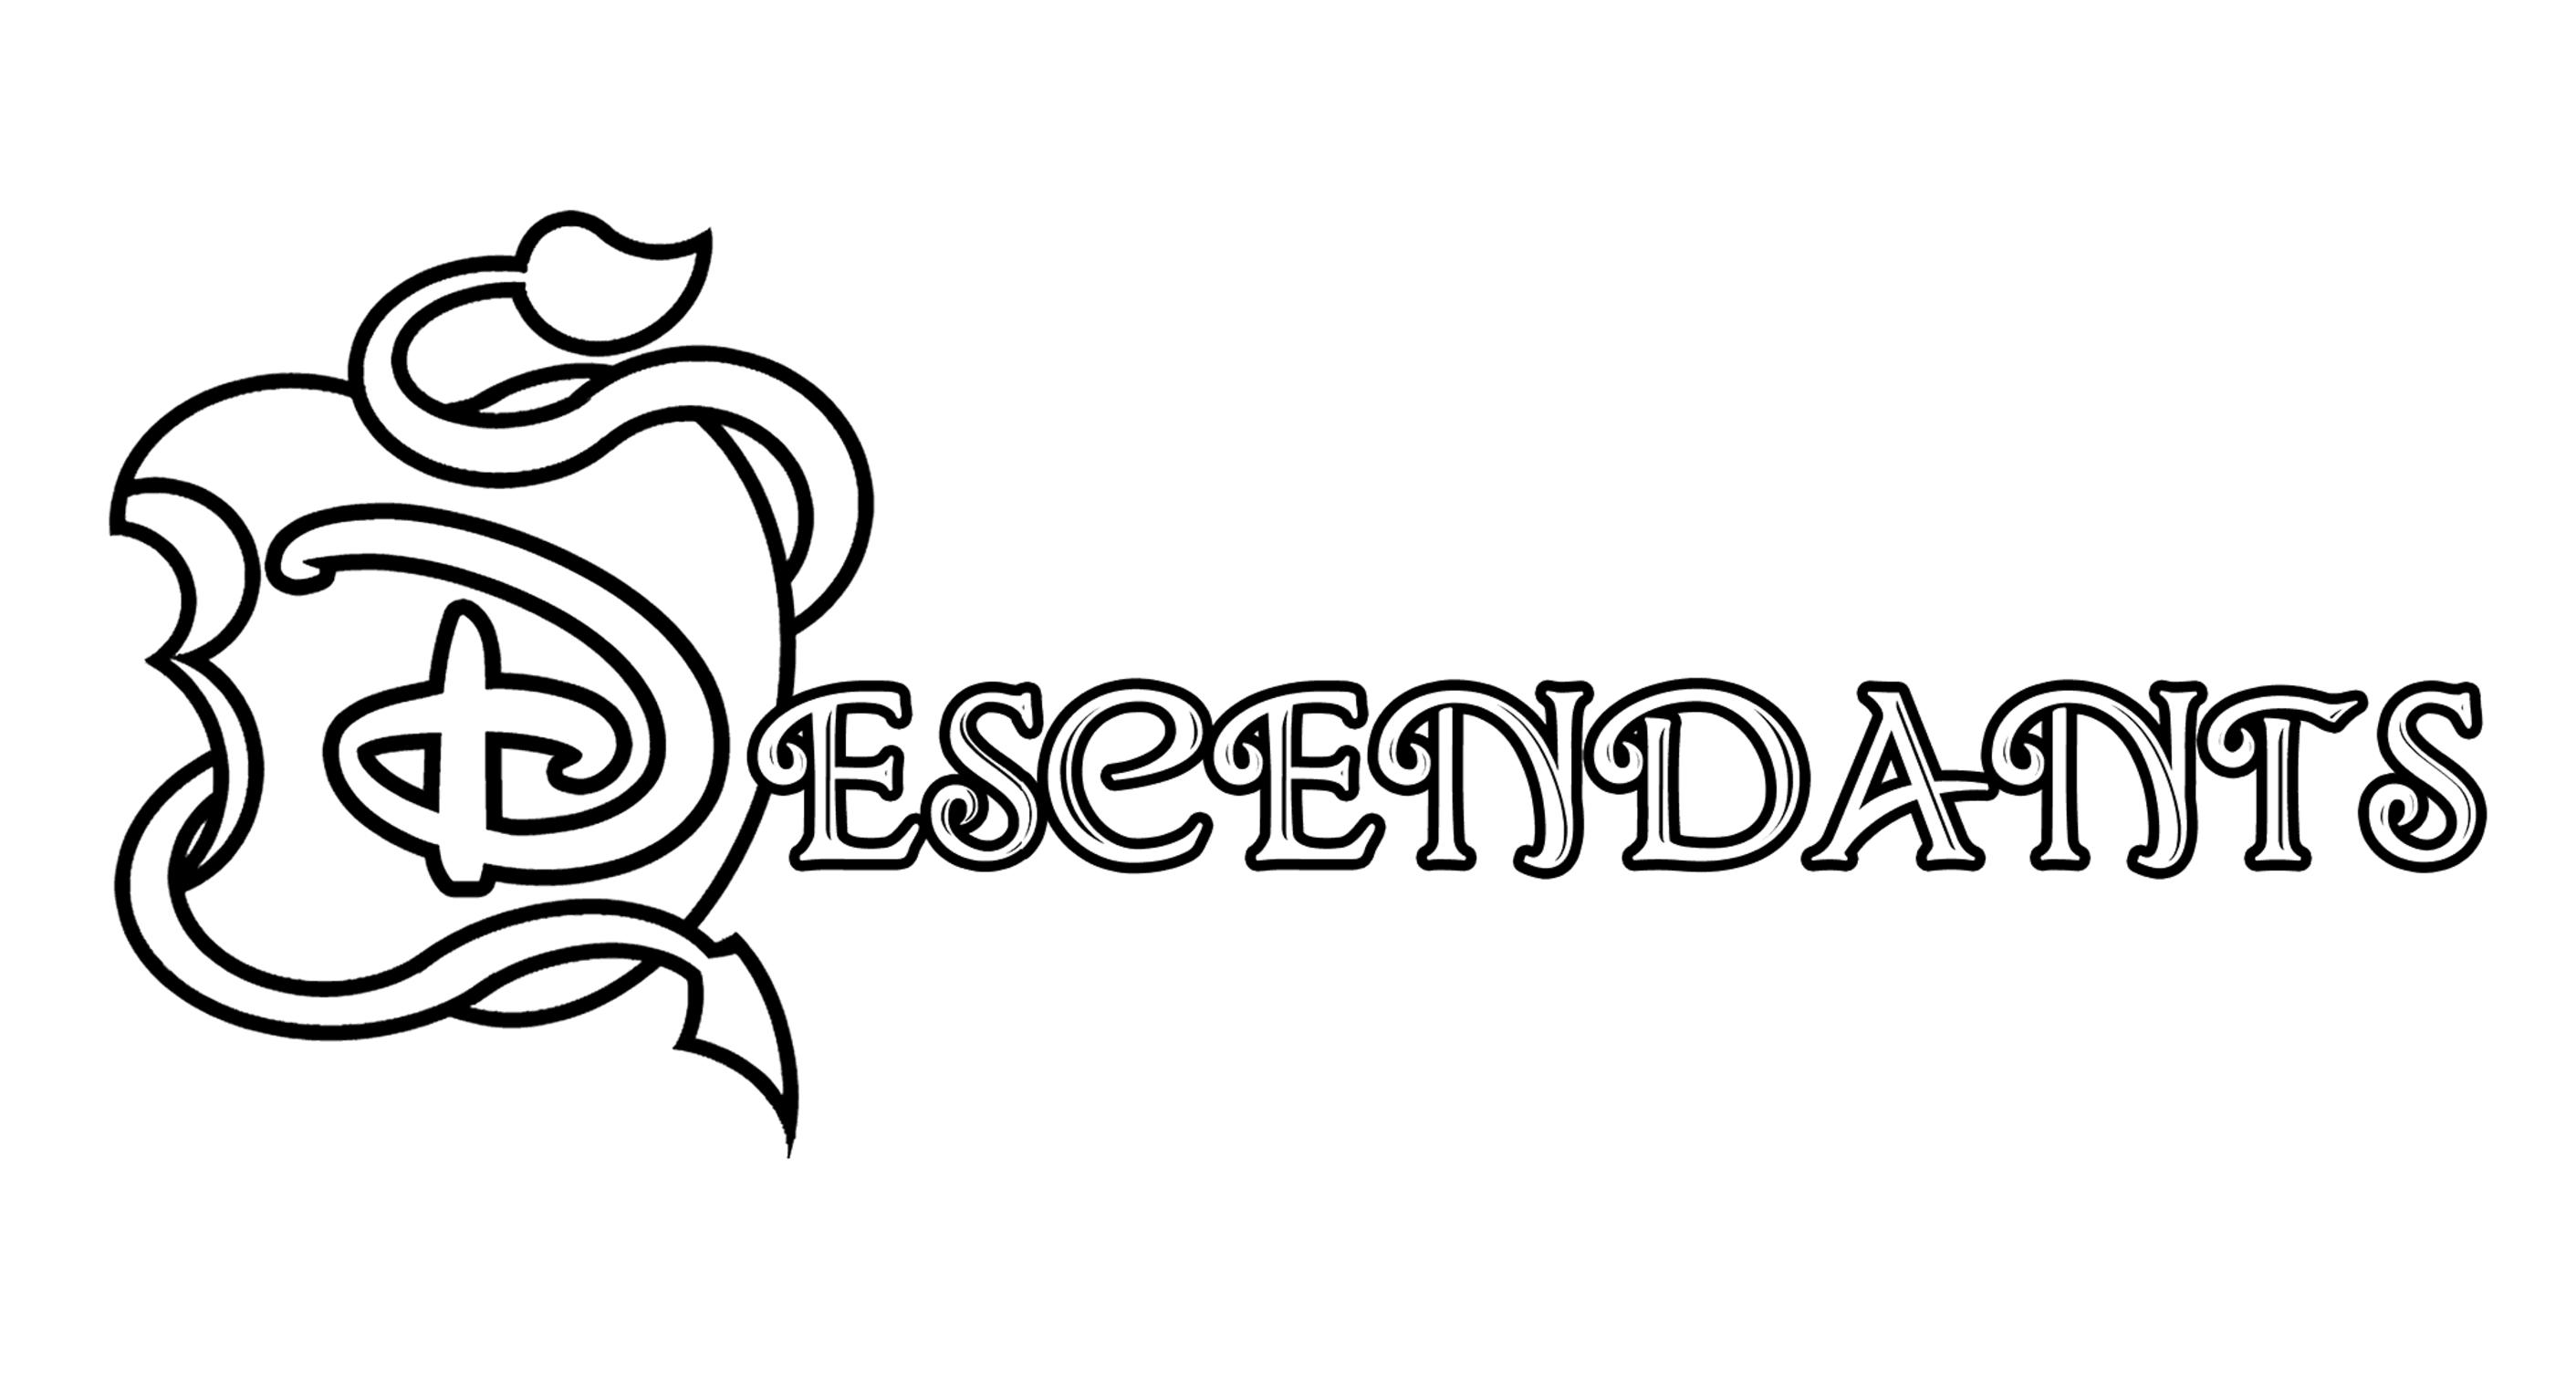 Logo The Descendants Disney